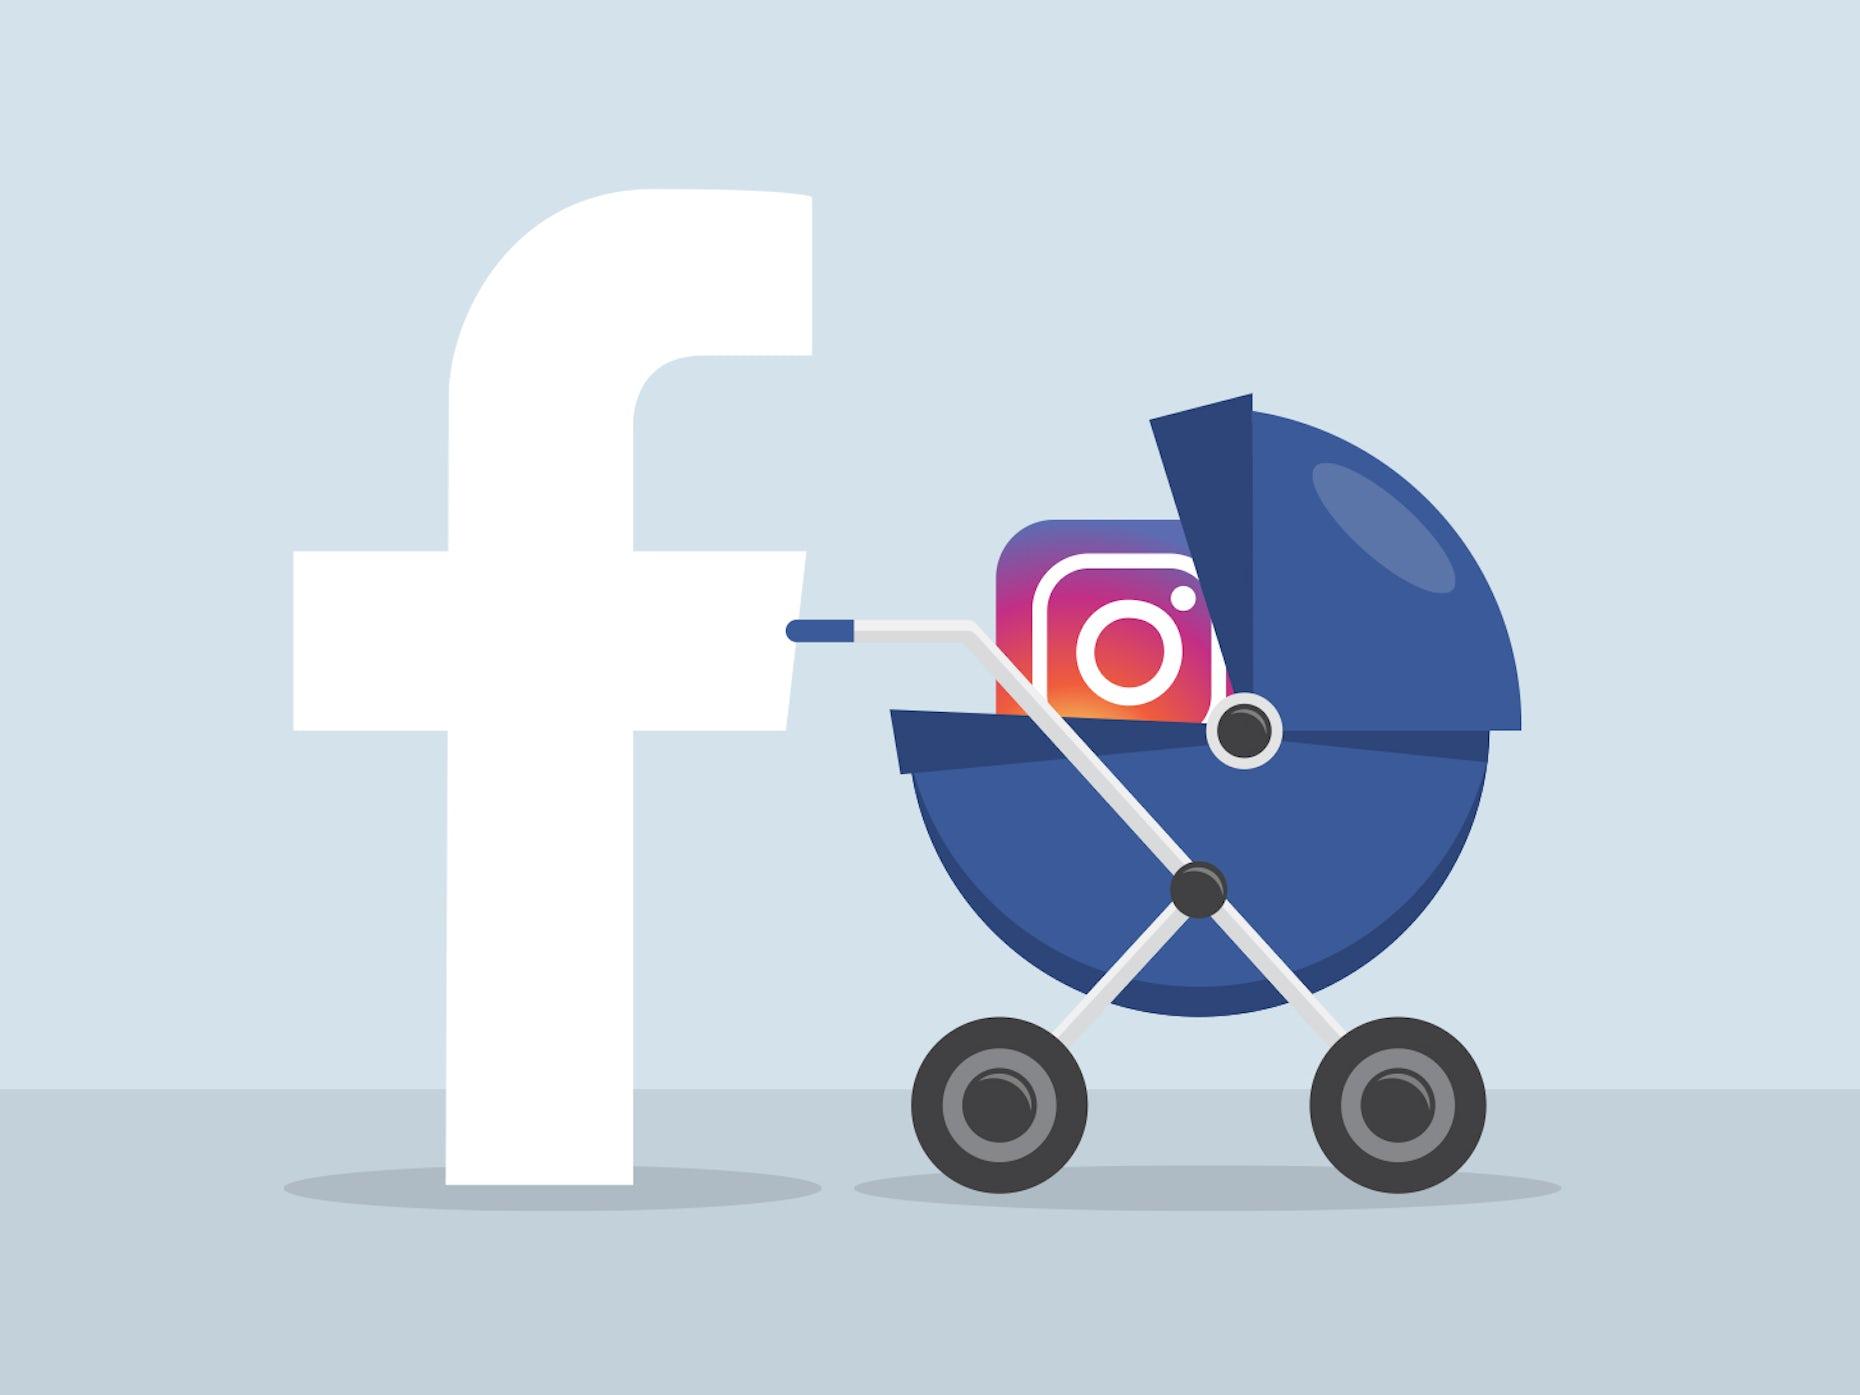 Instagram vs. facebook: what's the better marketing avenue? - 99designs